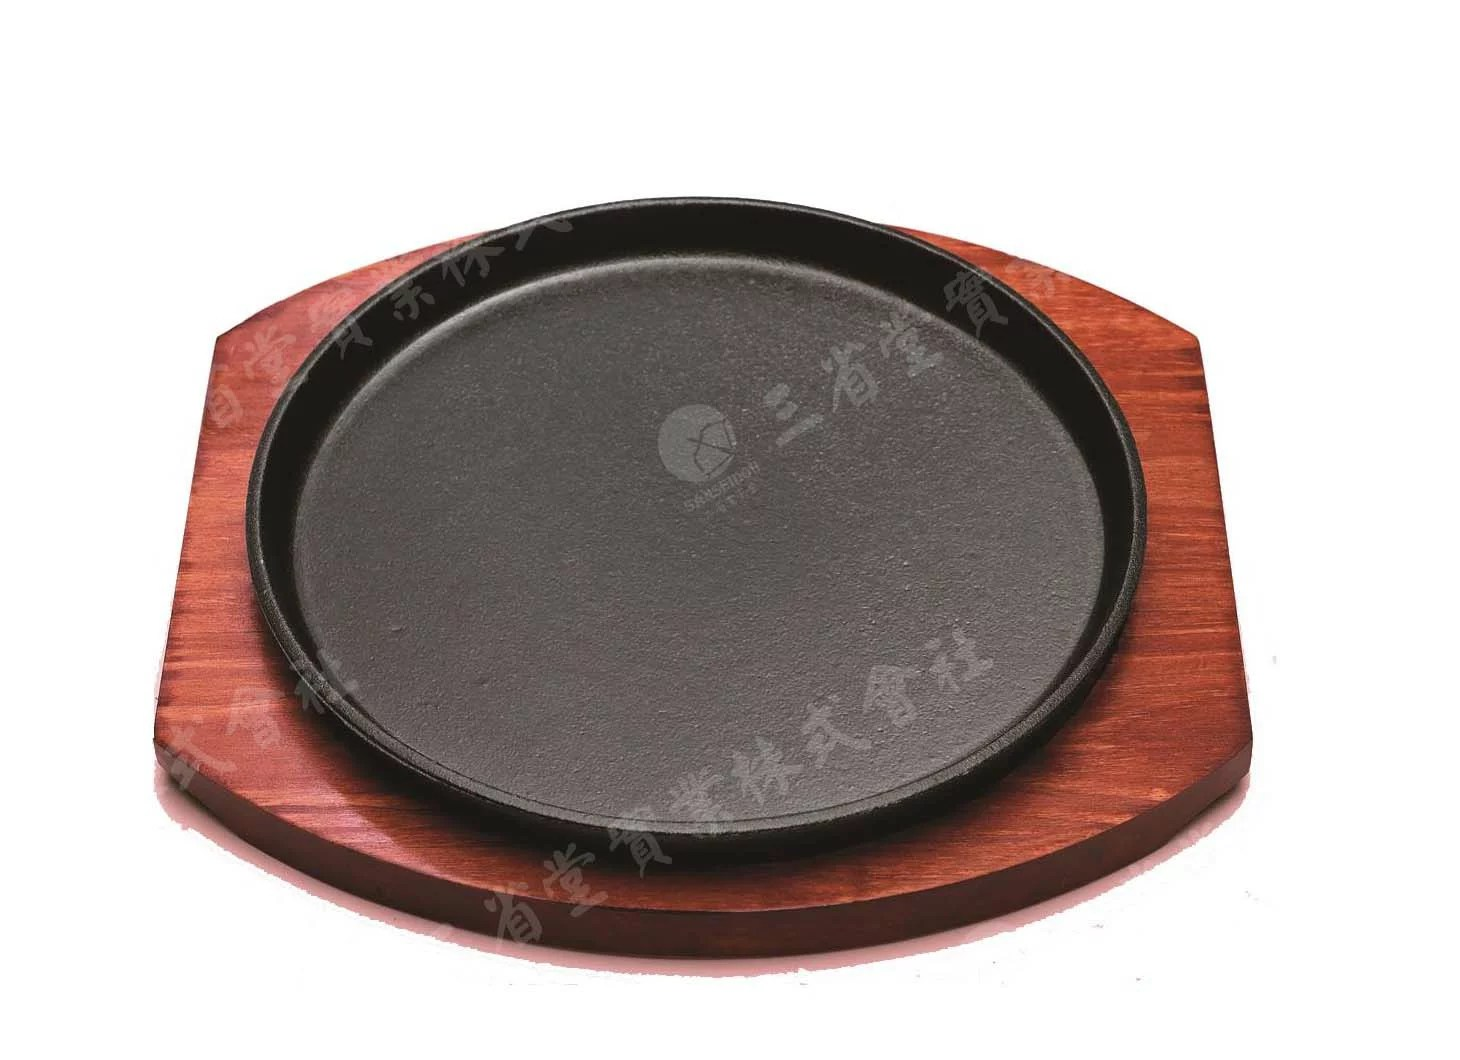 kitchen cabinets.com copper accessories 【楽天市場】【鉄板】18cmステーキ皿 丸型(ih対応)鉄板 ステーキ皿 sl2088 Φ180*h20(深さ ...